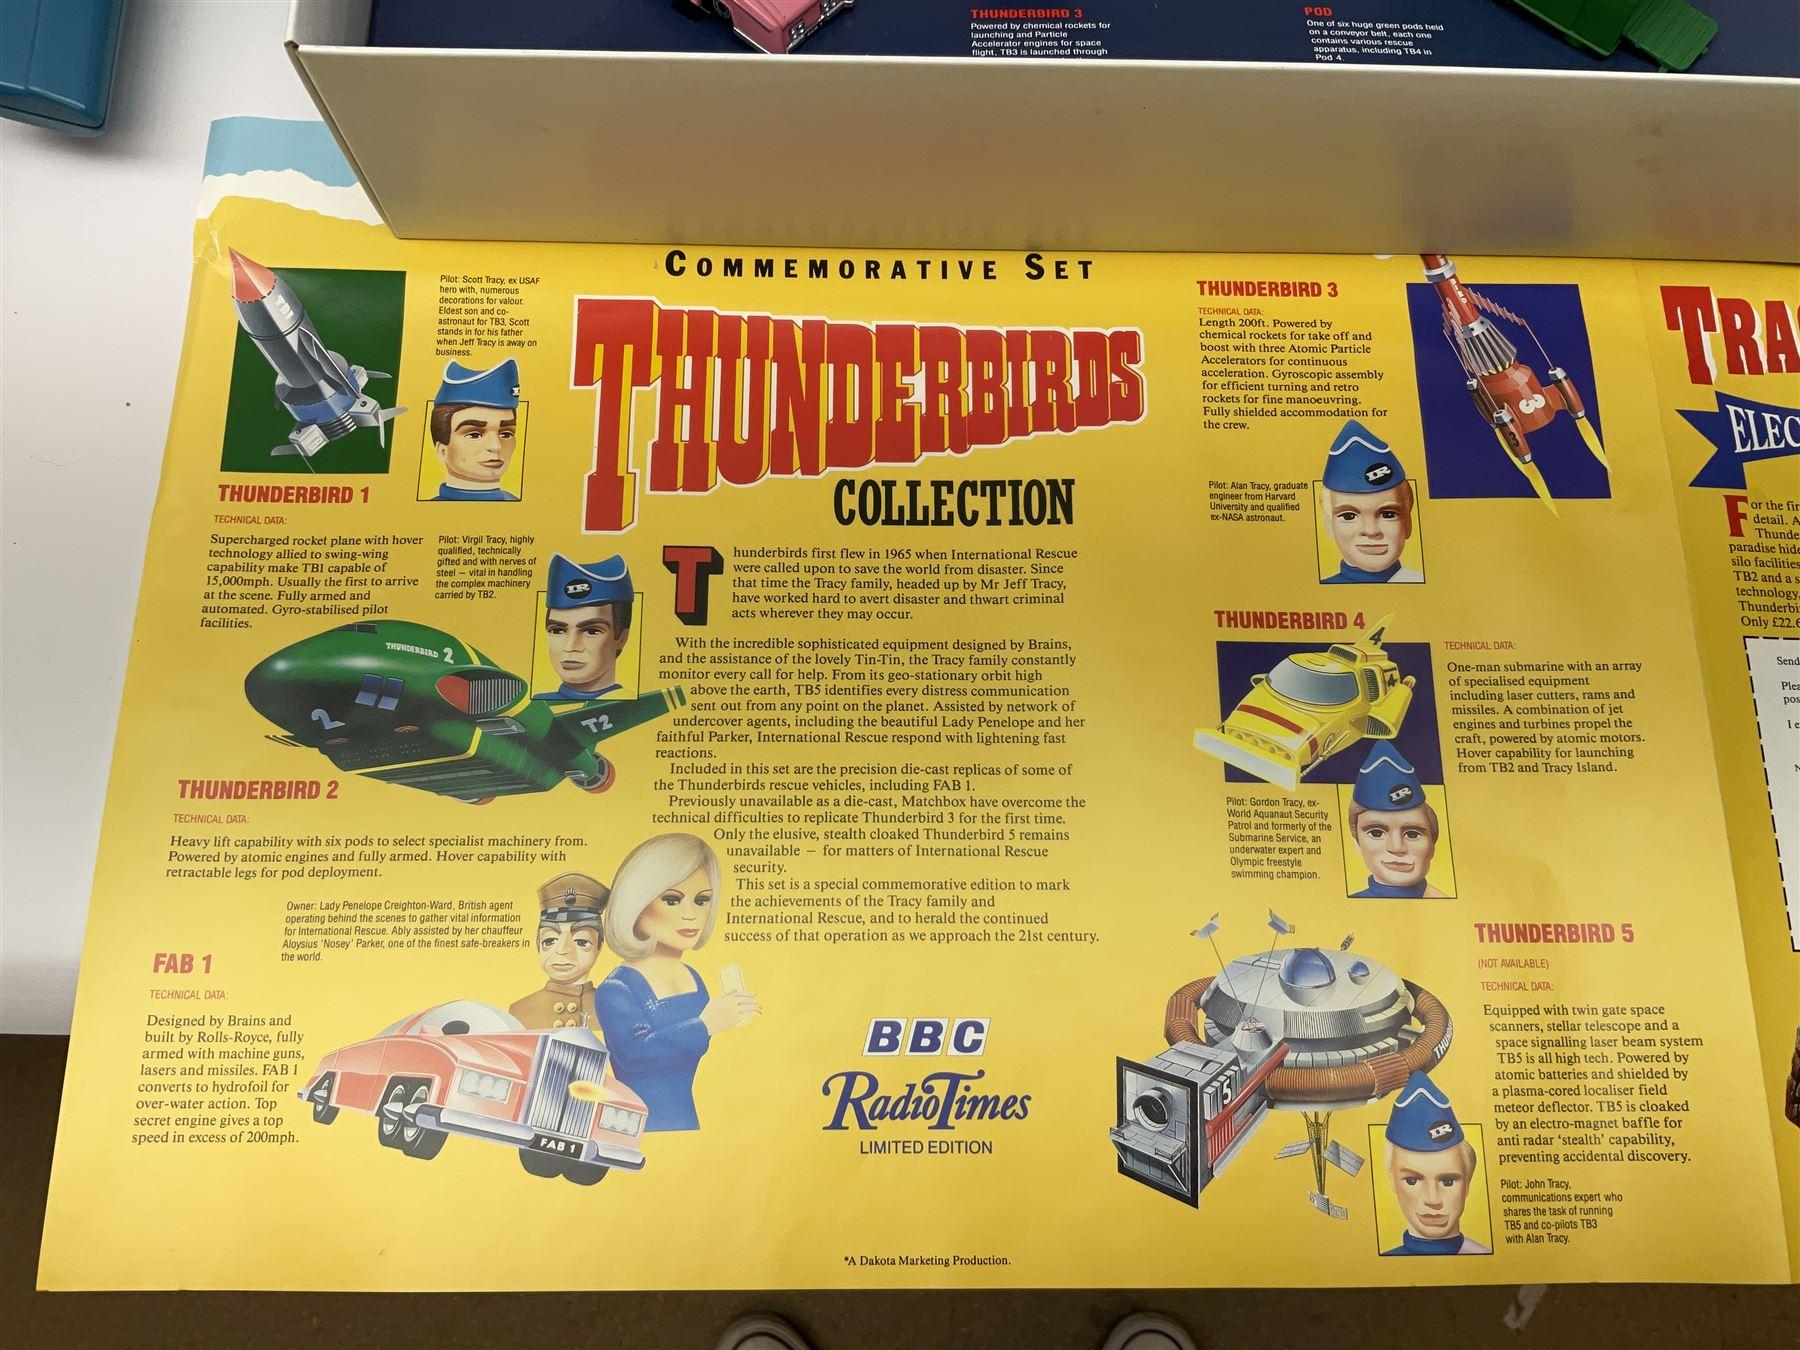 Matchbox 'The Thunderbirds' limited edition Commemorative Set - Image 6 of 7